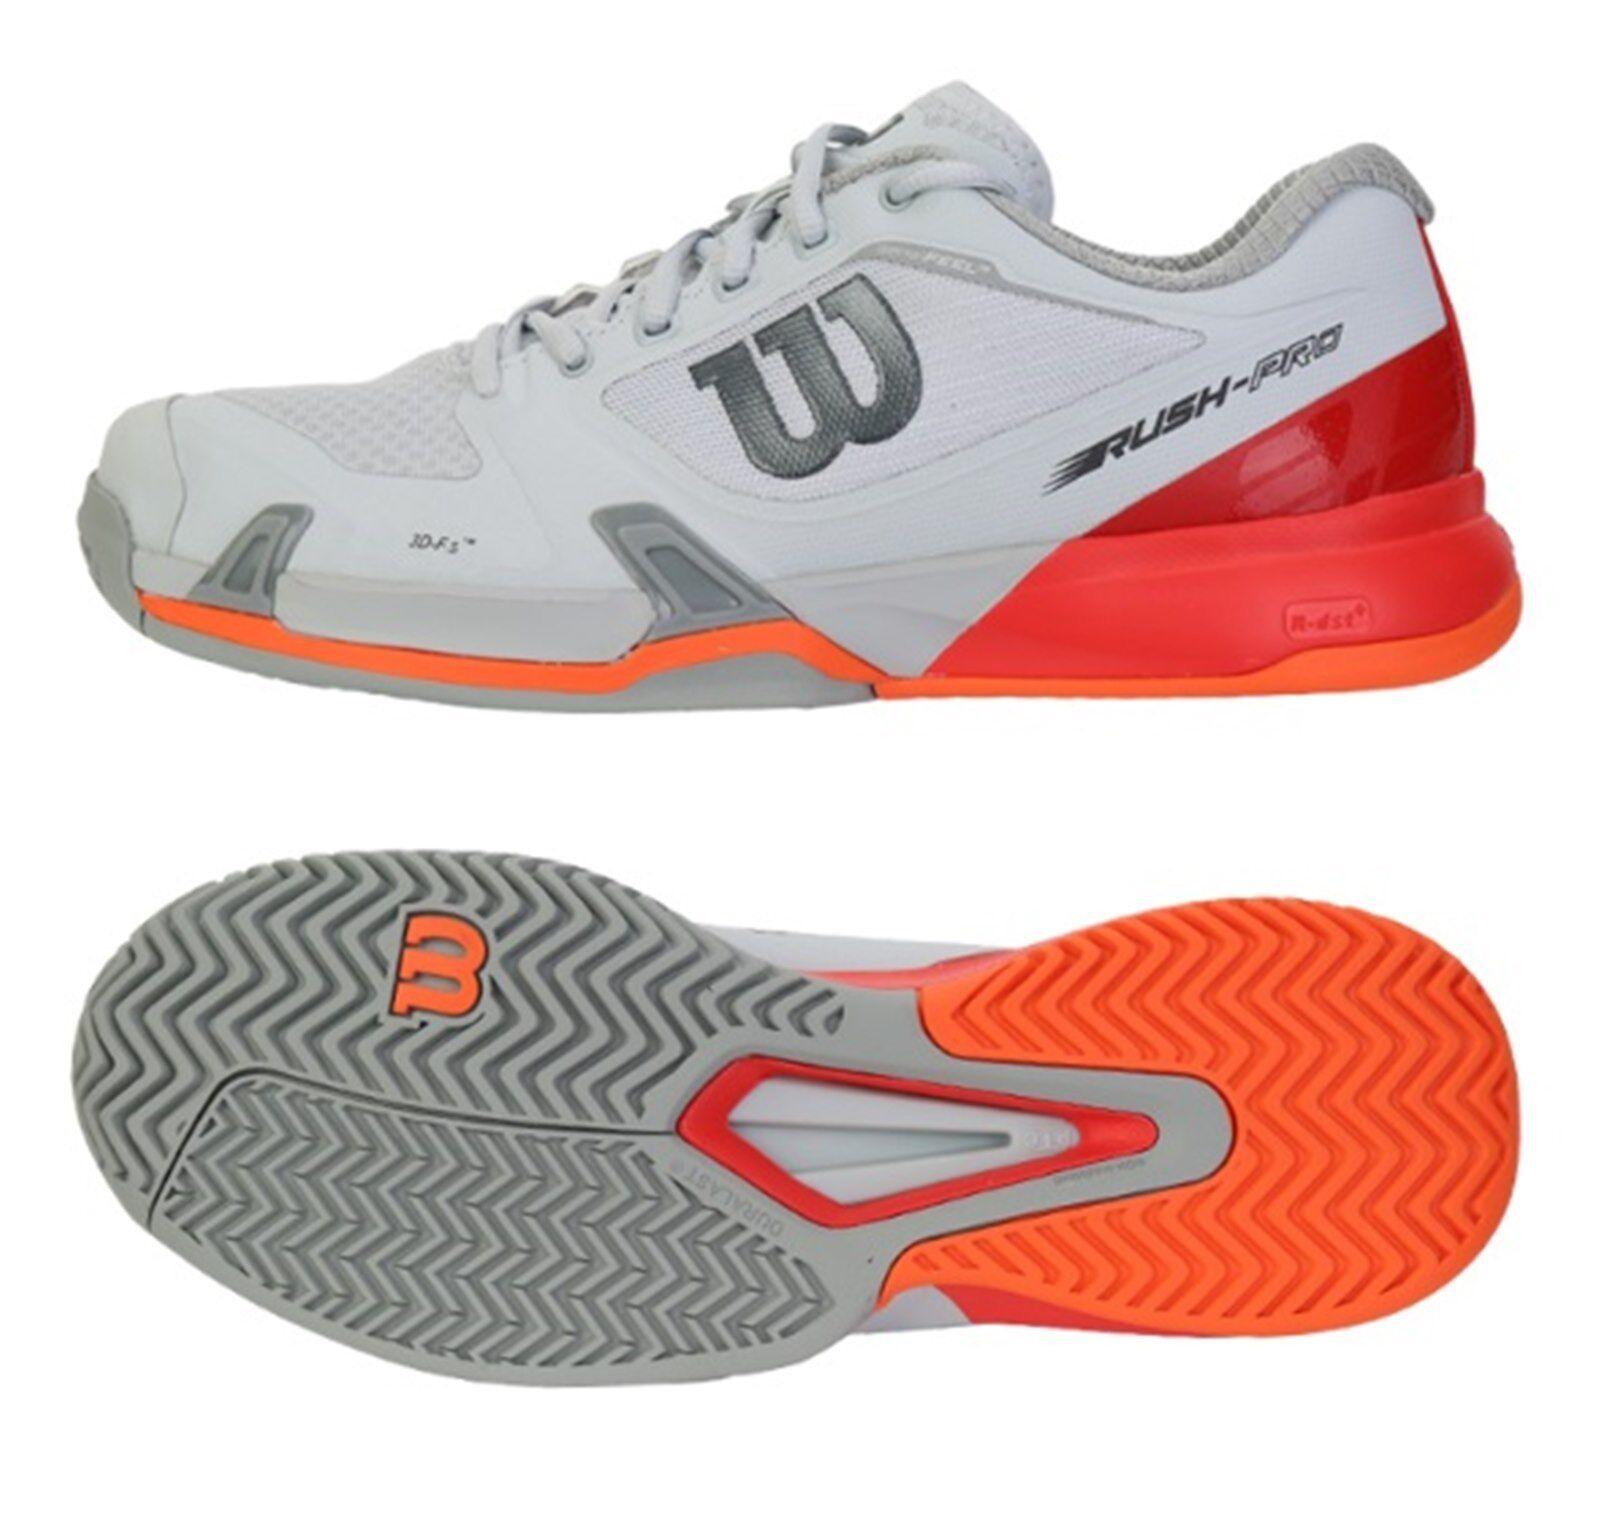 Wilson Rush Pro 2.5 De Hombre Zapatos tenis de correr gris Raqueta De Tenis Zapato WRS322630